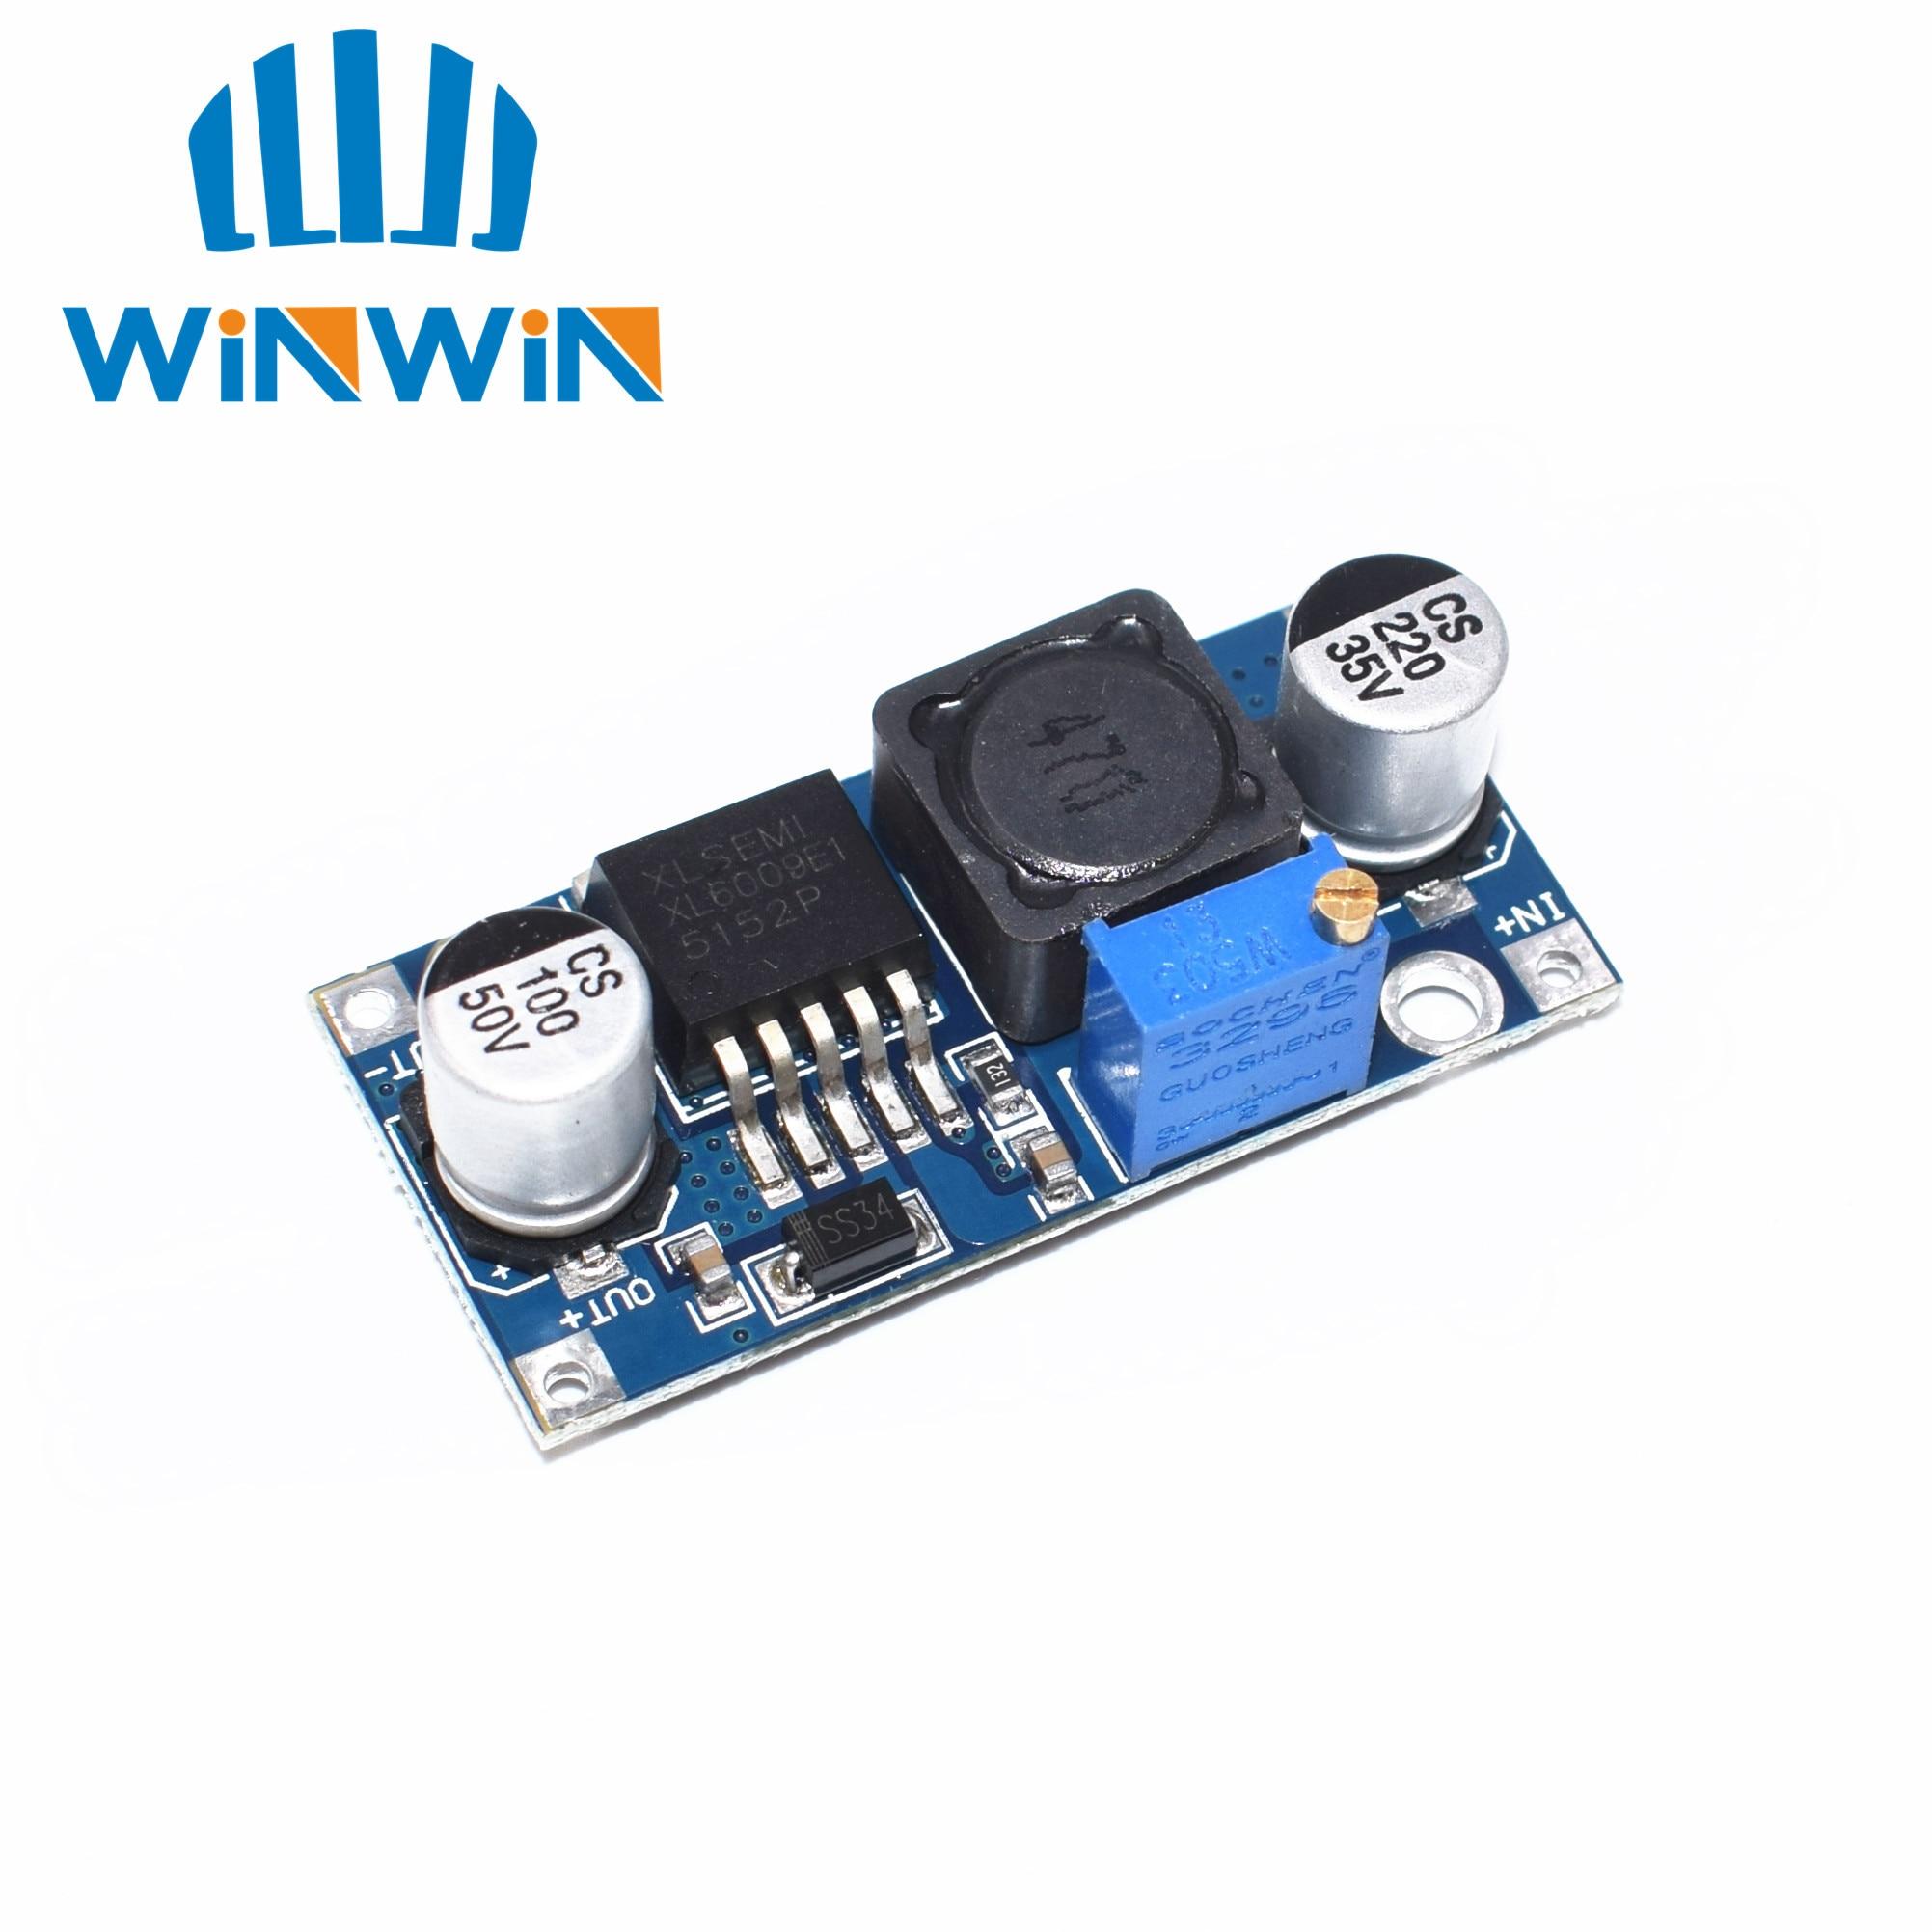 100pcs lot DC DC module power supply module XL6009 can raise pressure booster module super LM2577